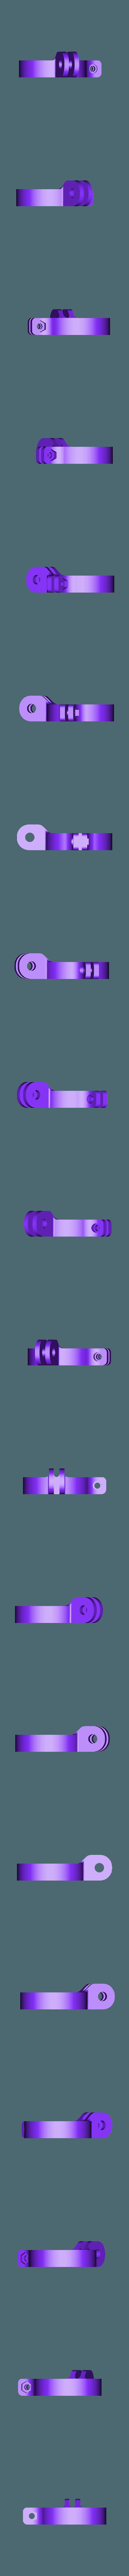 Feiyutech_G6_Clamp.stl Download free STL file Feiyutech G6 GoPro Gimbal Clamp • 3D print object, Kiwi3D